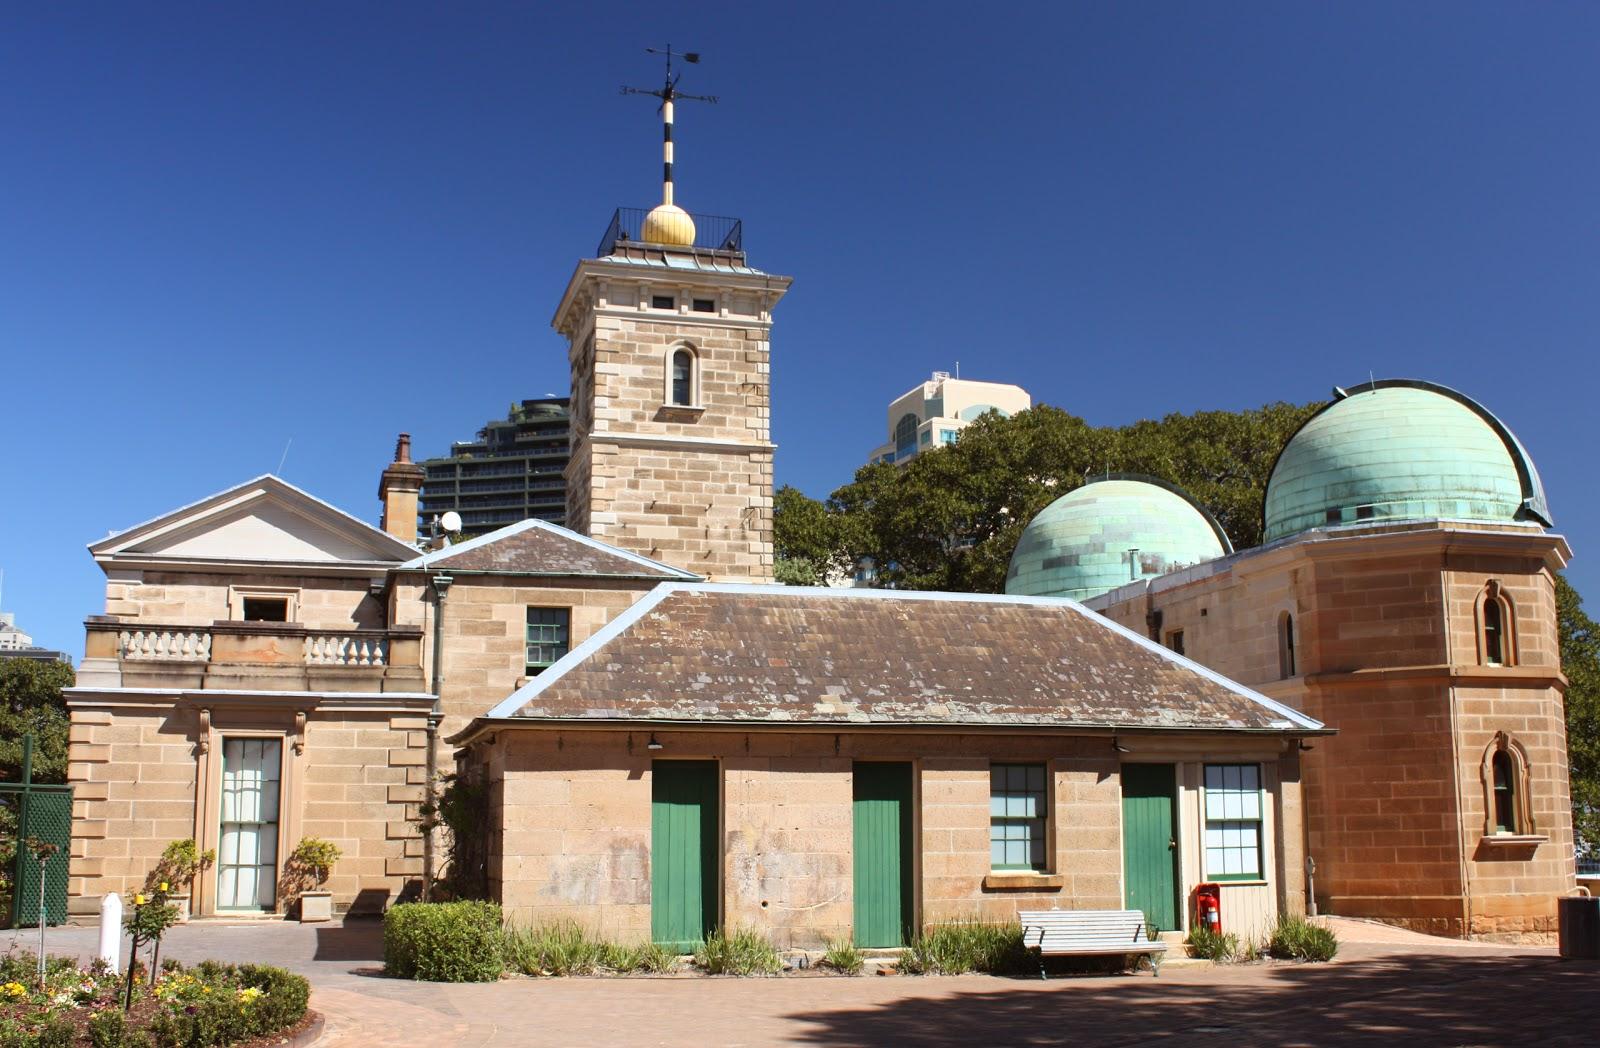 observatory hill sydney australia - photo#15